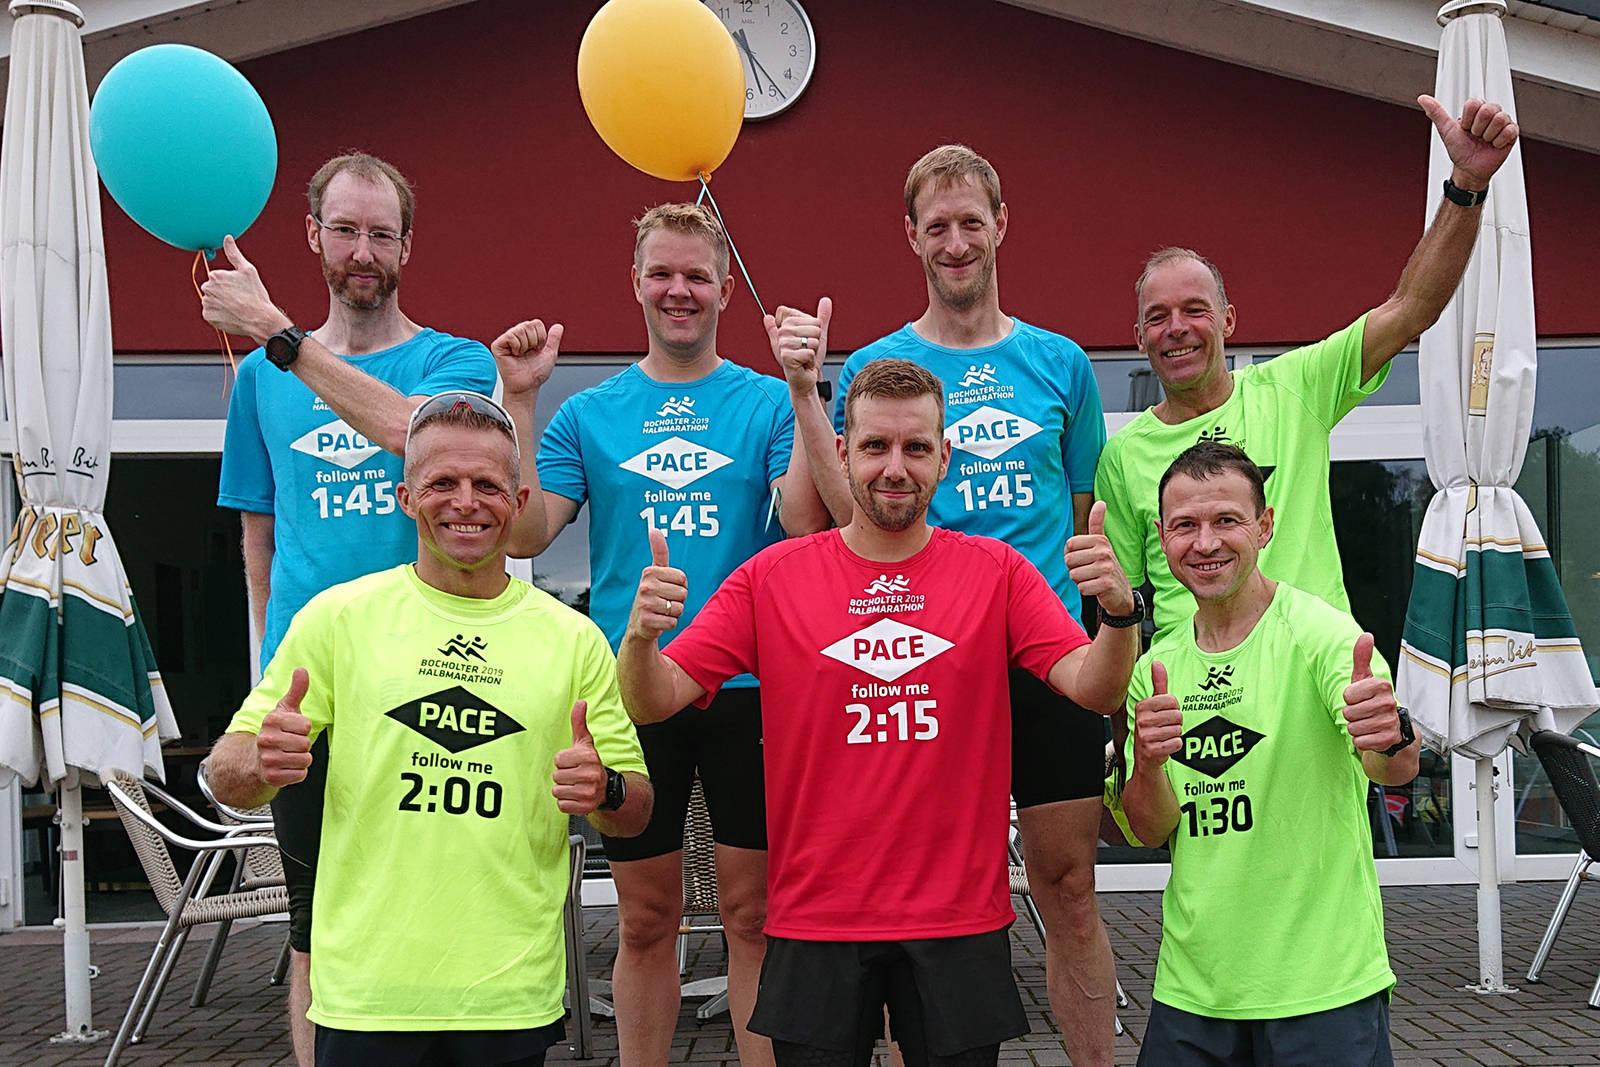 Pacemaker beim ersten Bocholter Halbmarathon: Andre Pütter, Mike Eiting, Stefan Werner, Ralf Himpler (hinten v.l.n.r.), Patrick Heitkamp, Simon Schlebusch, Bernd Diekmann (vorne v.l.n.r.) (Foto: SSV)